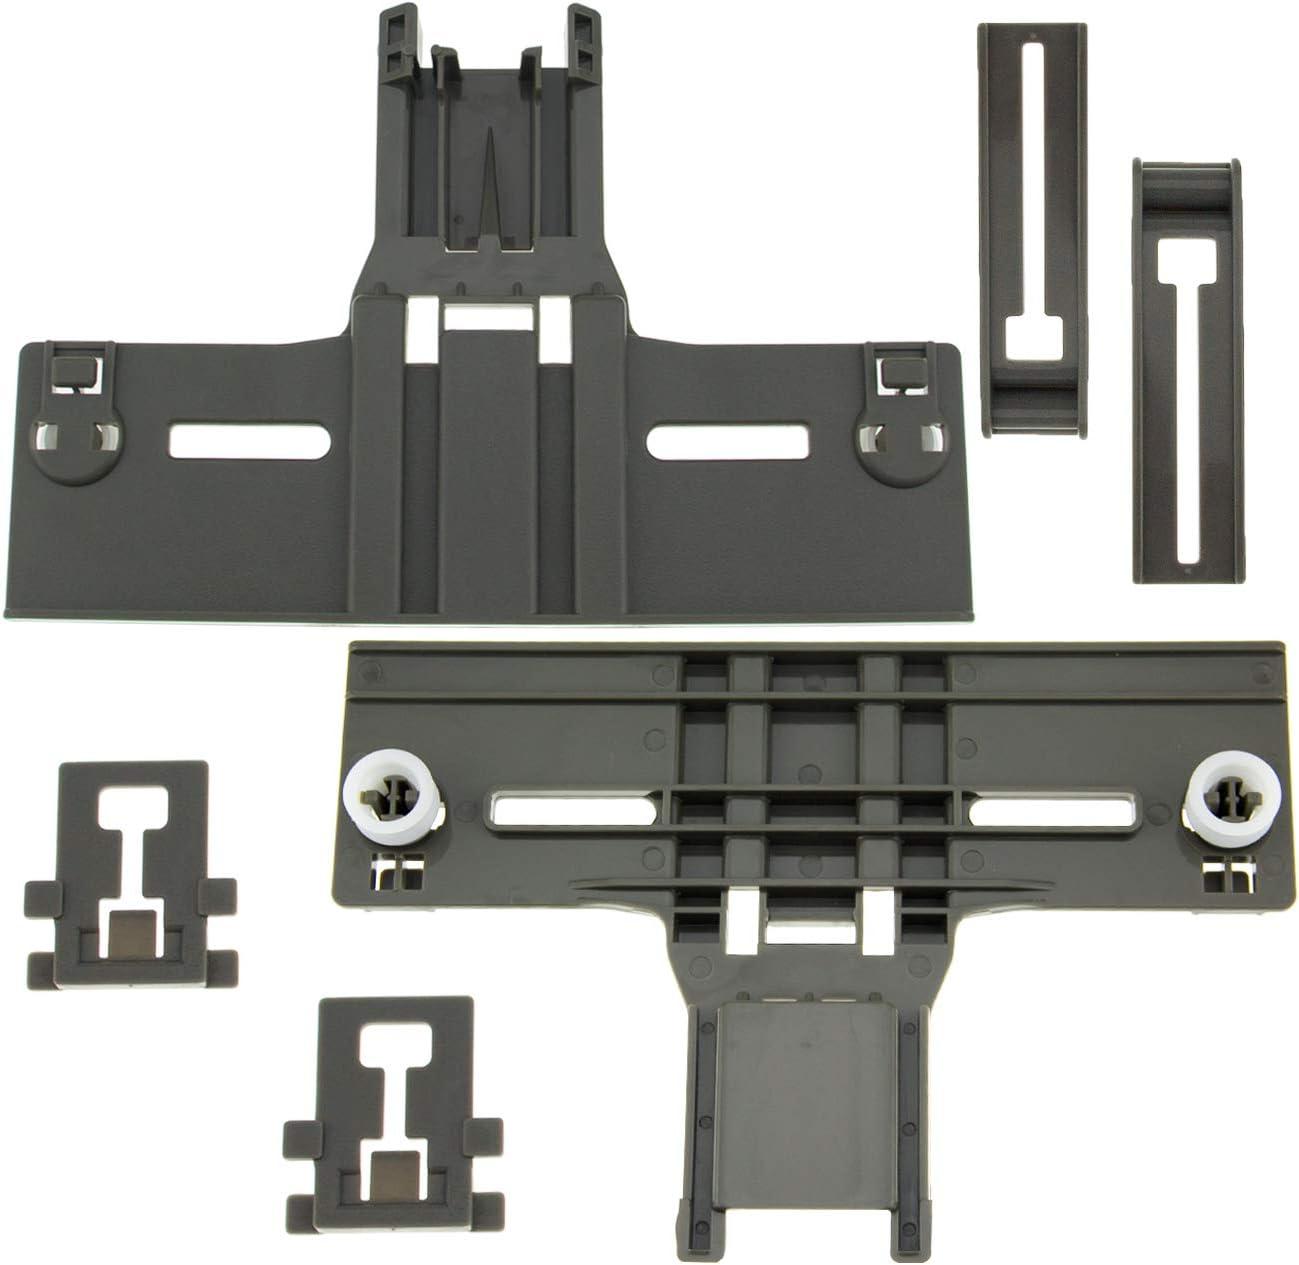 W10350376 Dishwasher Top Rack Adjuster & W10195839 Dishwasher Rack Adjuster & W10195840 Dishwasher Positioner Fit For Whirlpool Dishwasher